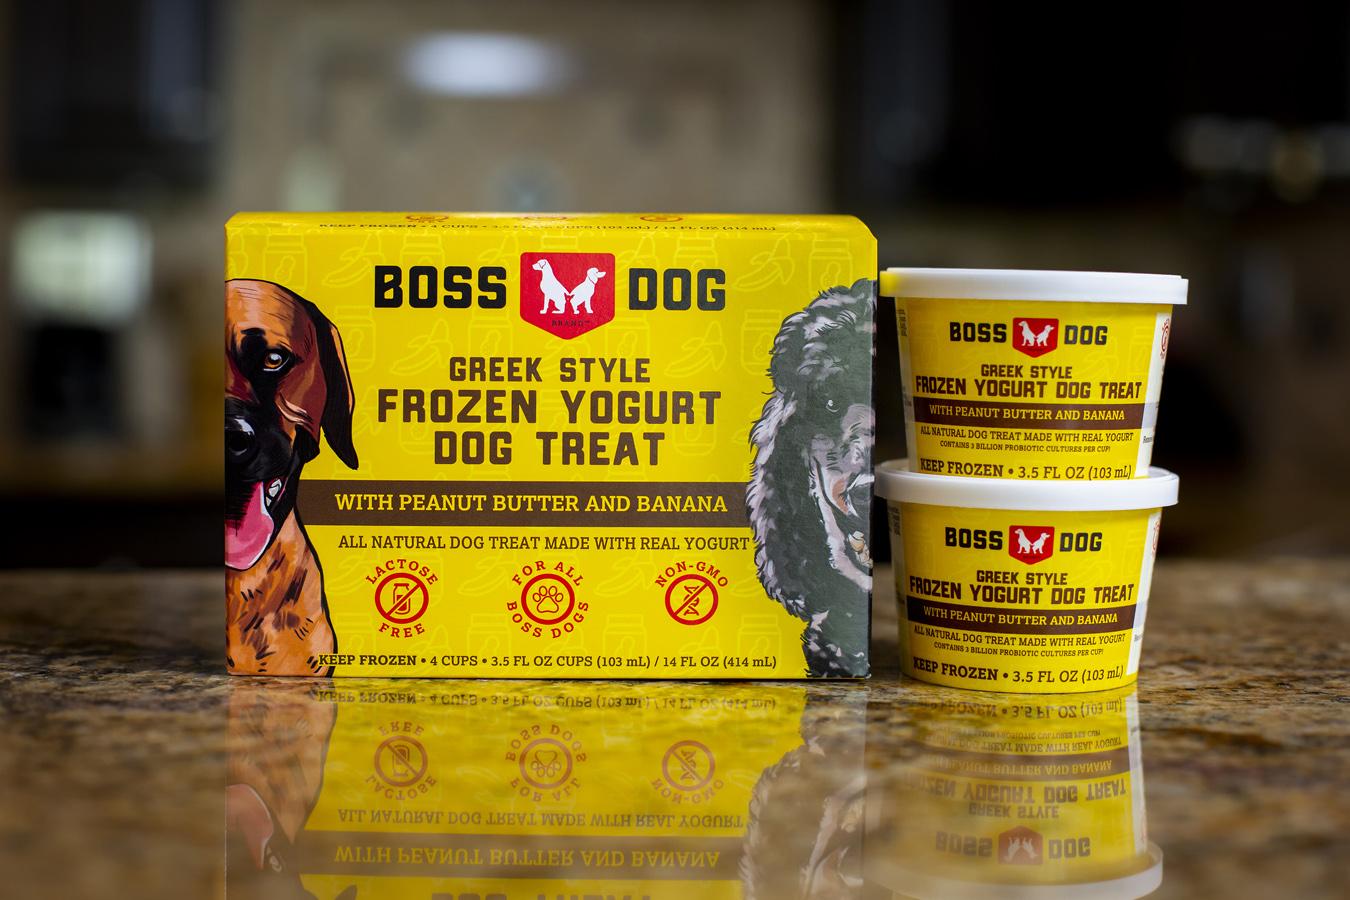 Boss Dog PB & Banana Frozen Yogurt Dog Treats Image